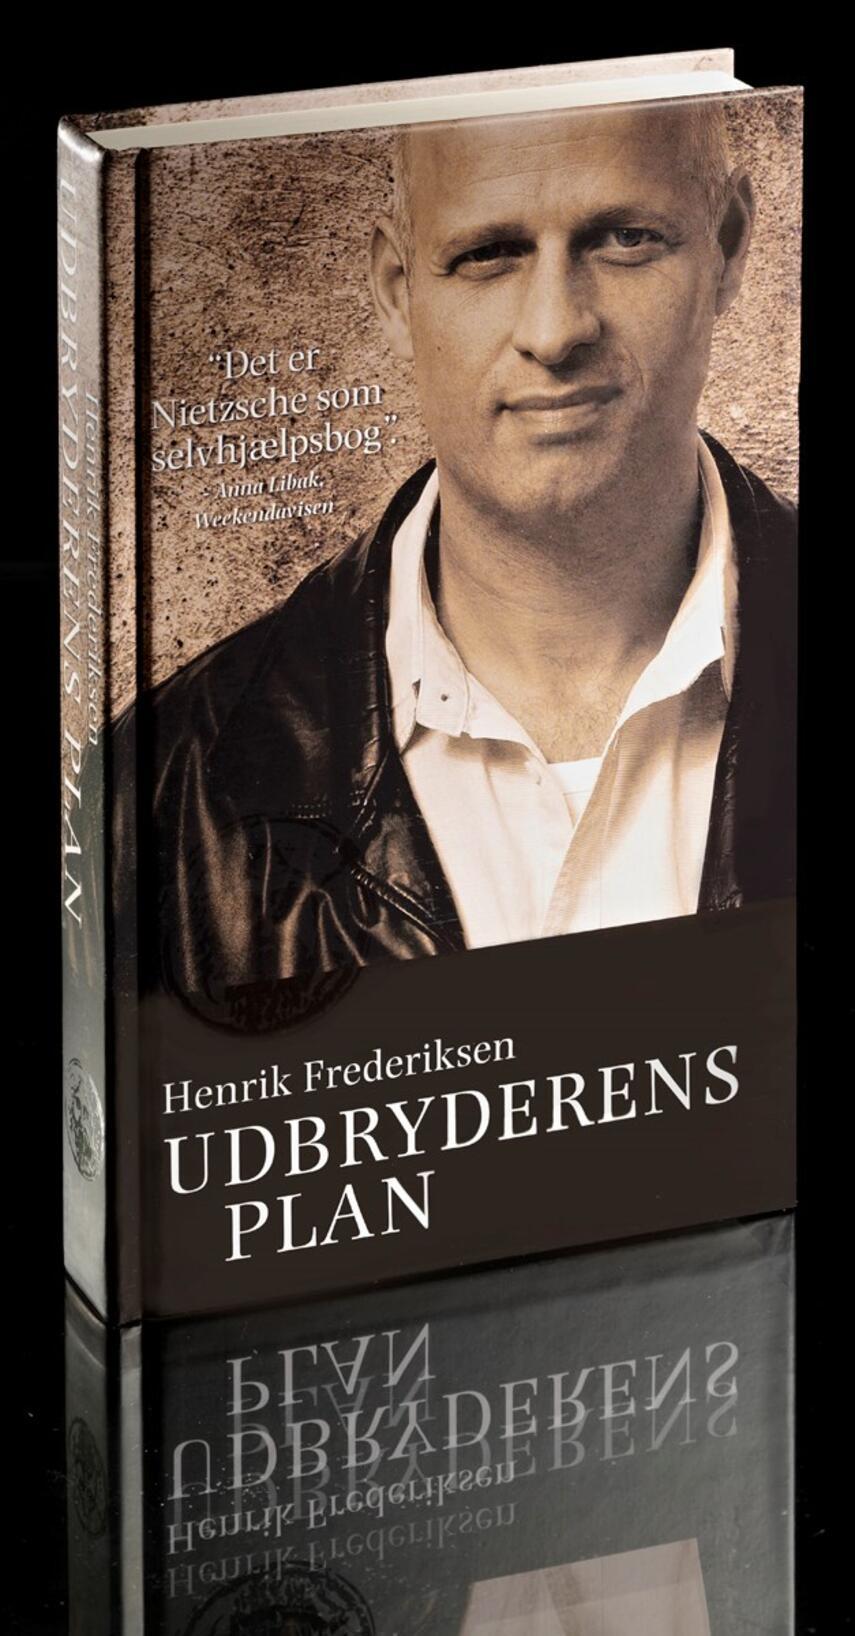 Henrik Frederiksen (f. 1965): Udbryderens plan